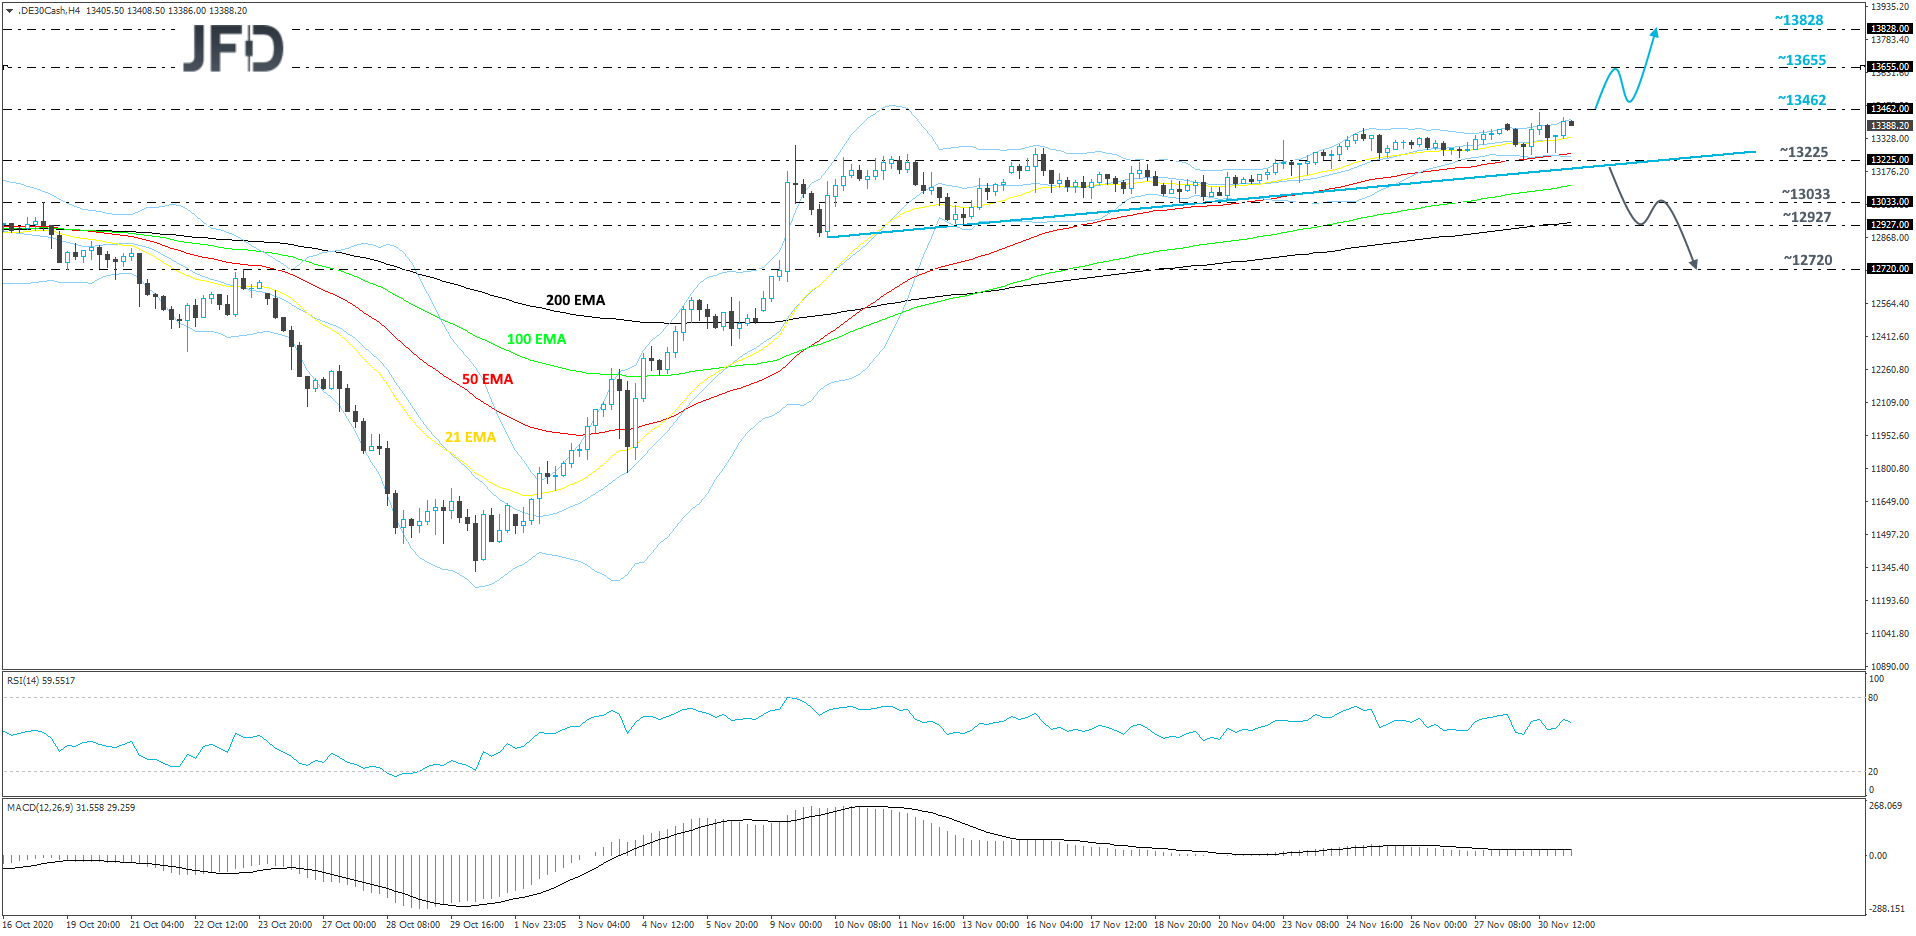 DAX 4-hour chart technical analysis